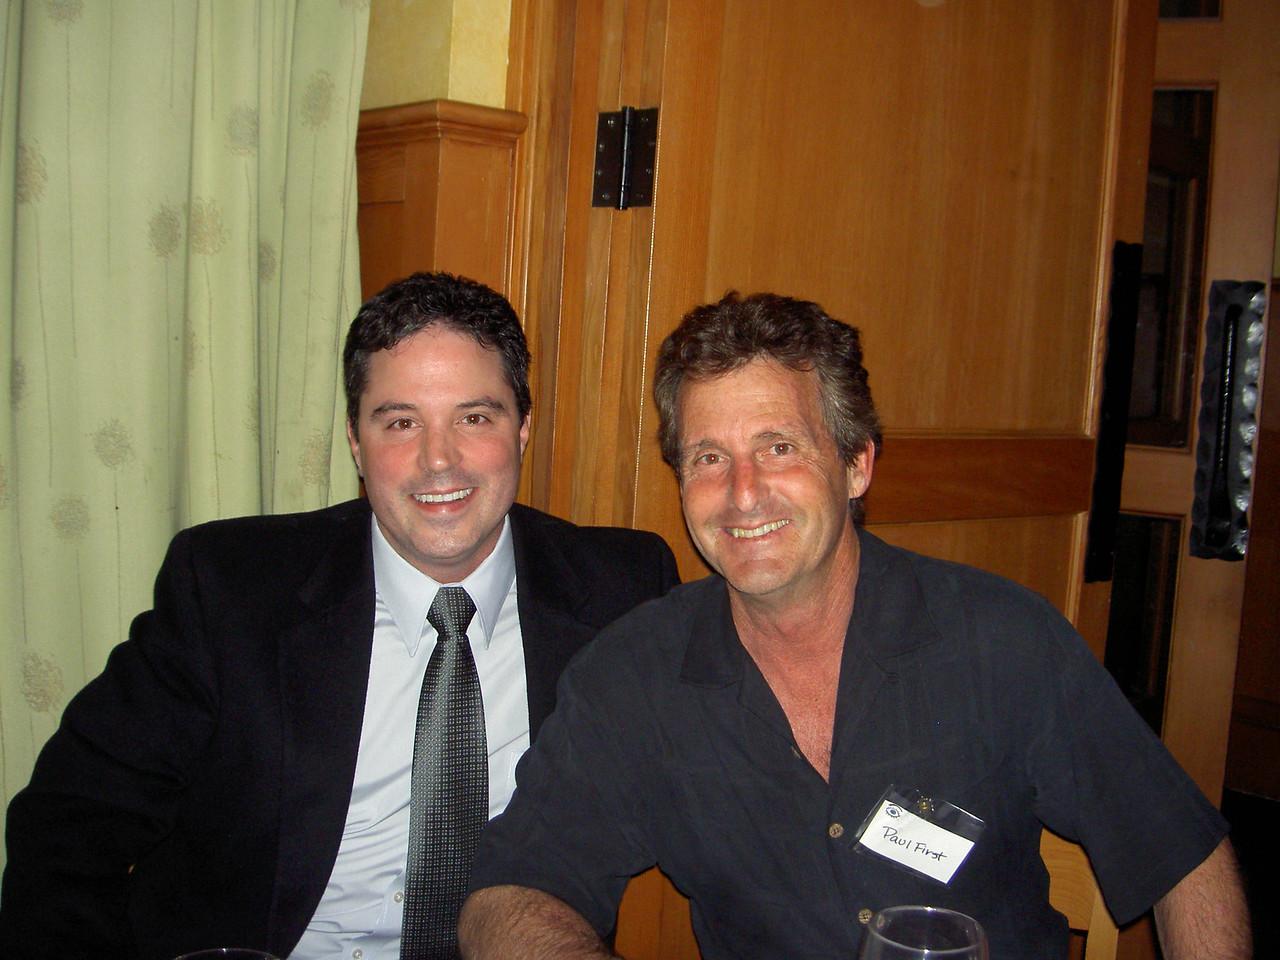 0409 Nick Marsico & Paul First